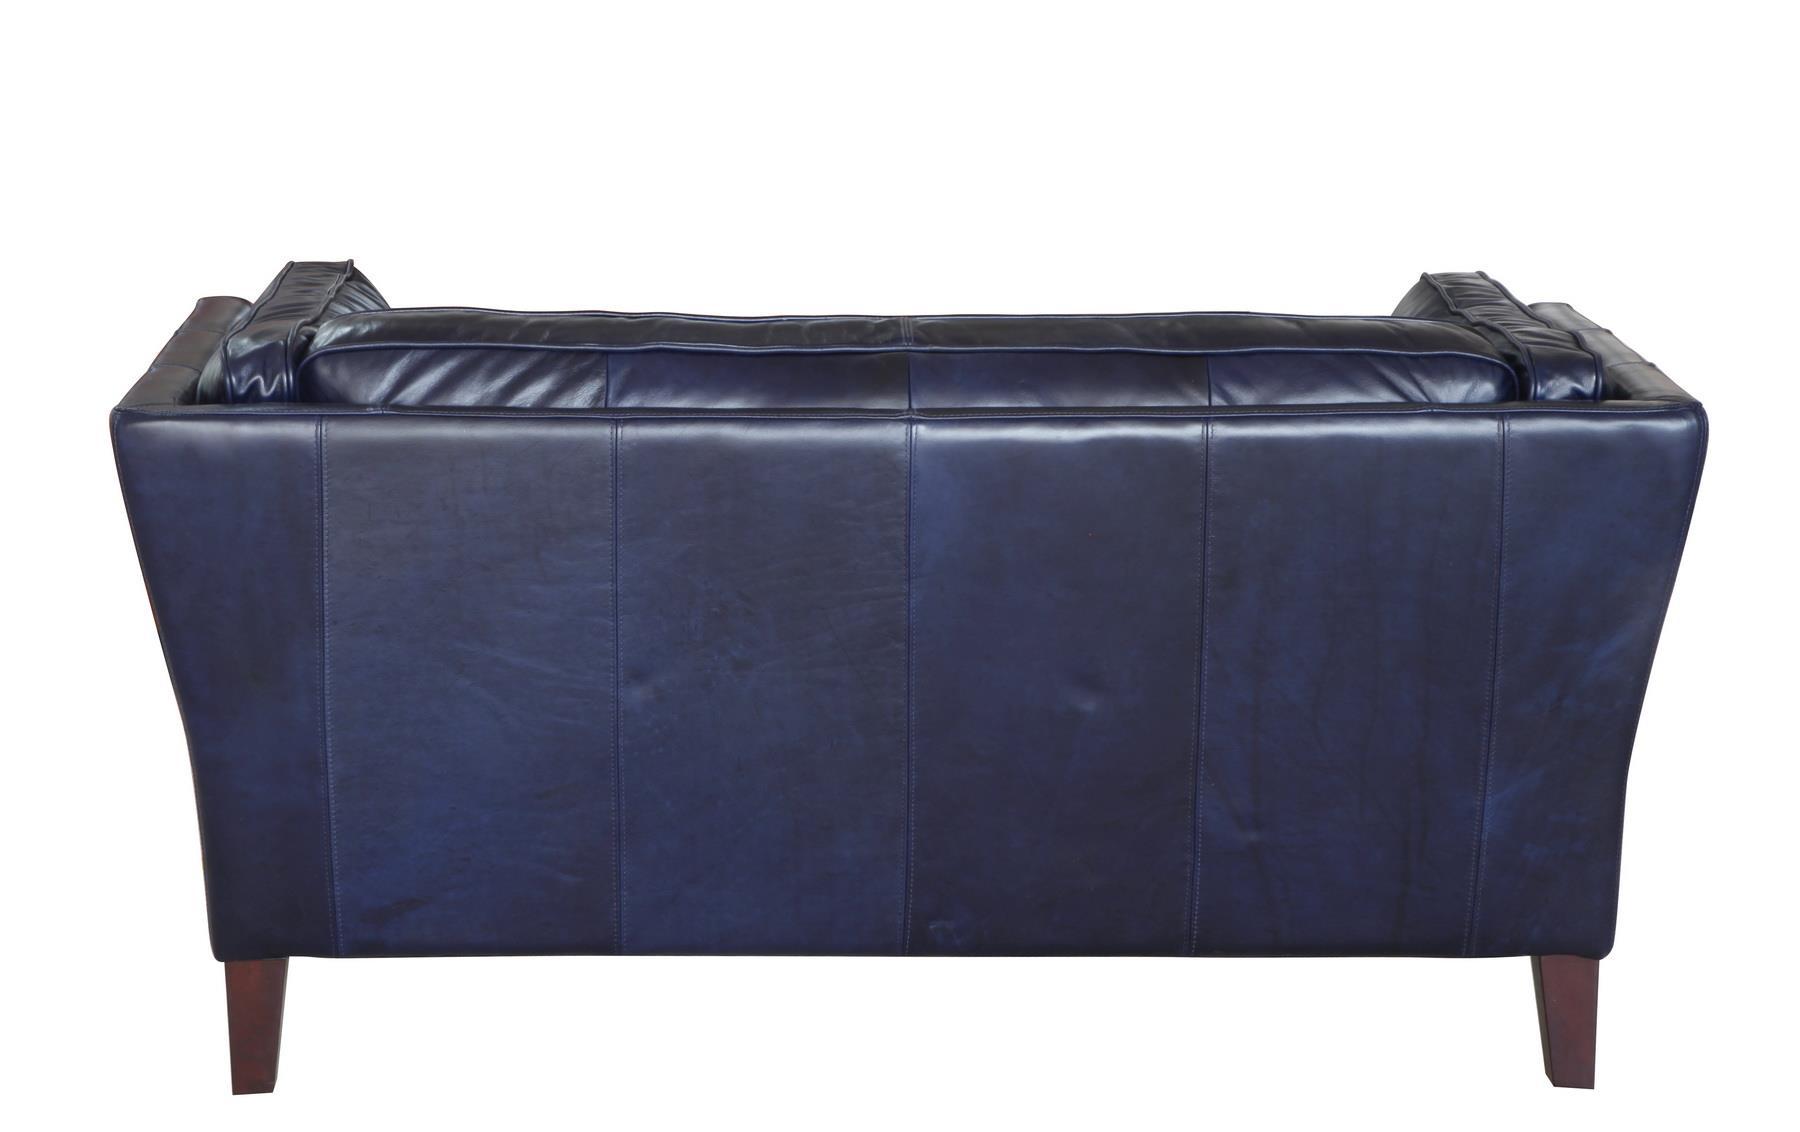 Alberta 1525 Top Grain Leather Sofa in Navy